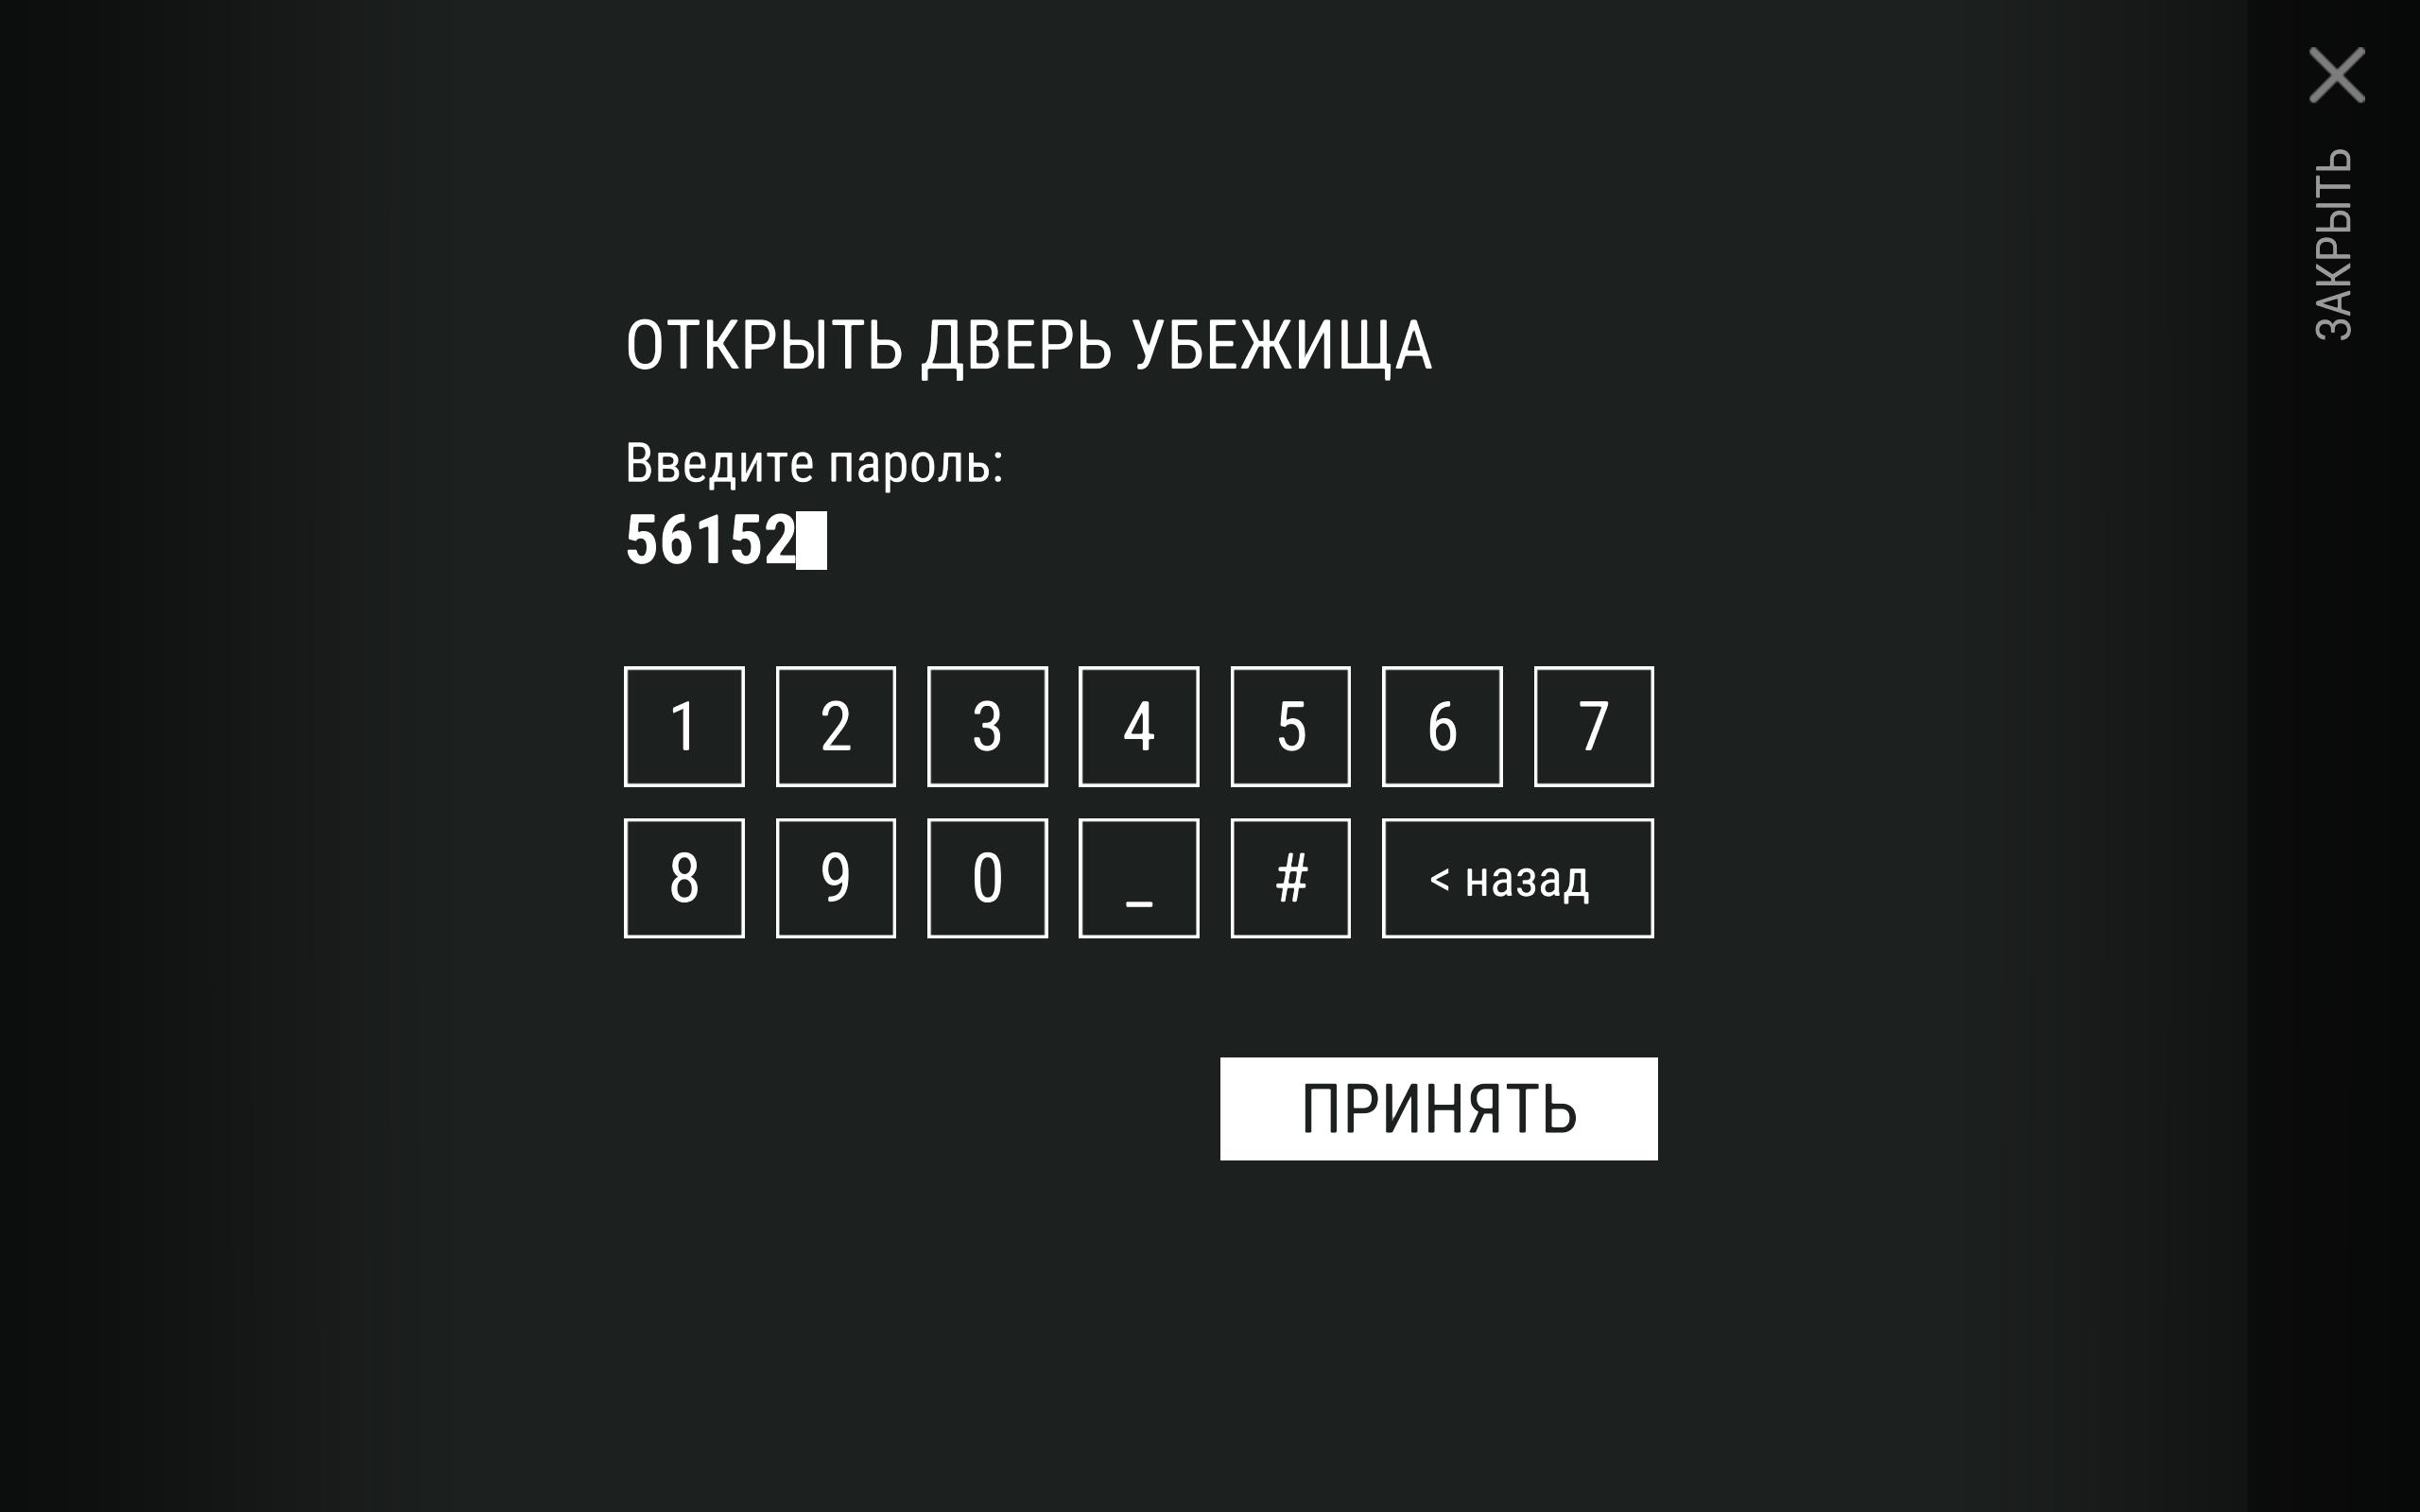 Screenshot_2017-07-31-19-38-52.png